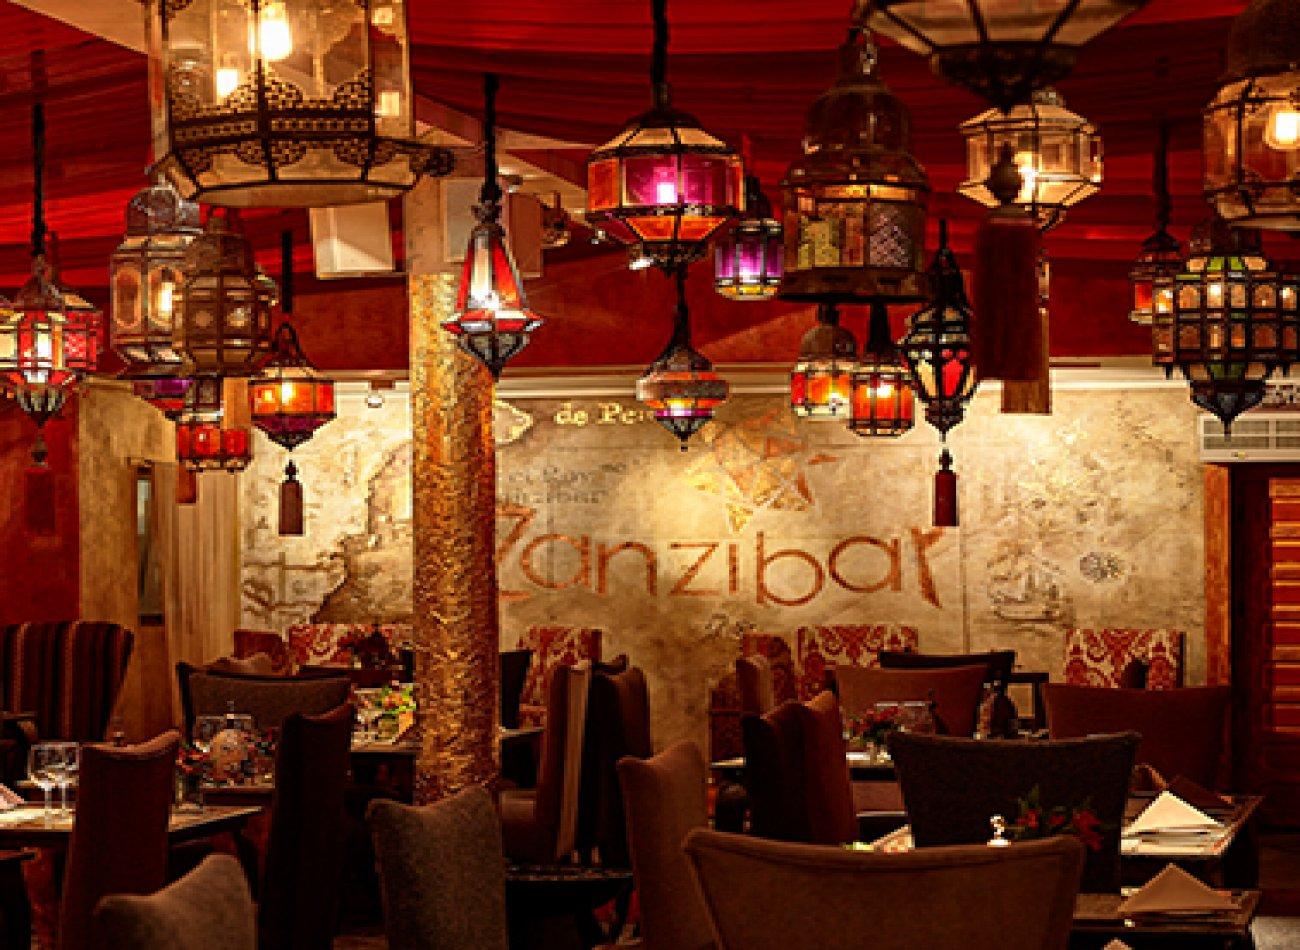 ZANZIBAR RESTAURANT Restaurante - Reserva en restaurantes de Comida INTERNACIONAL - VITACURA - MESA 24/7 | SANTIAGO - Perú